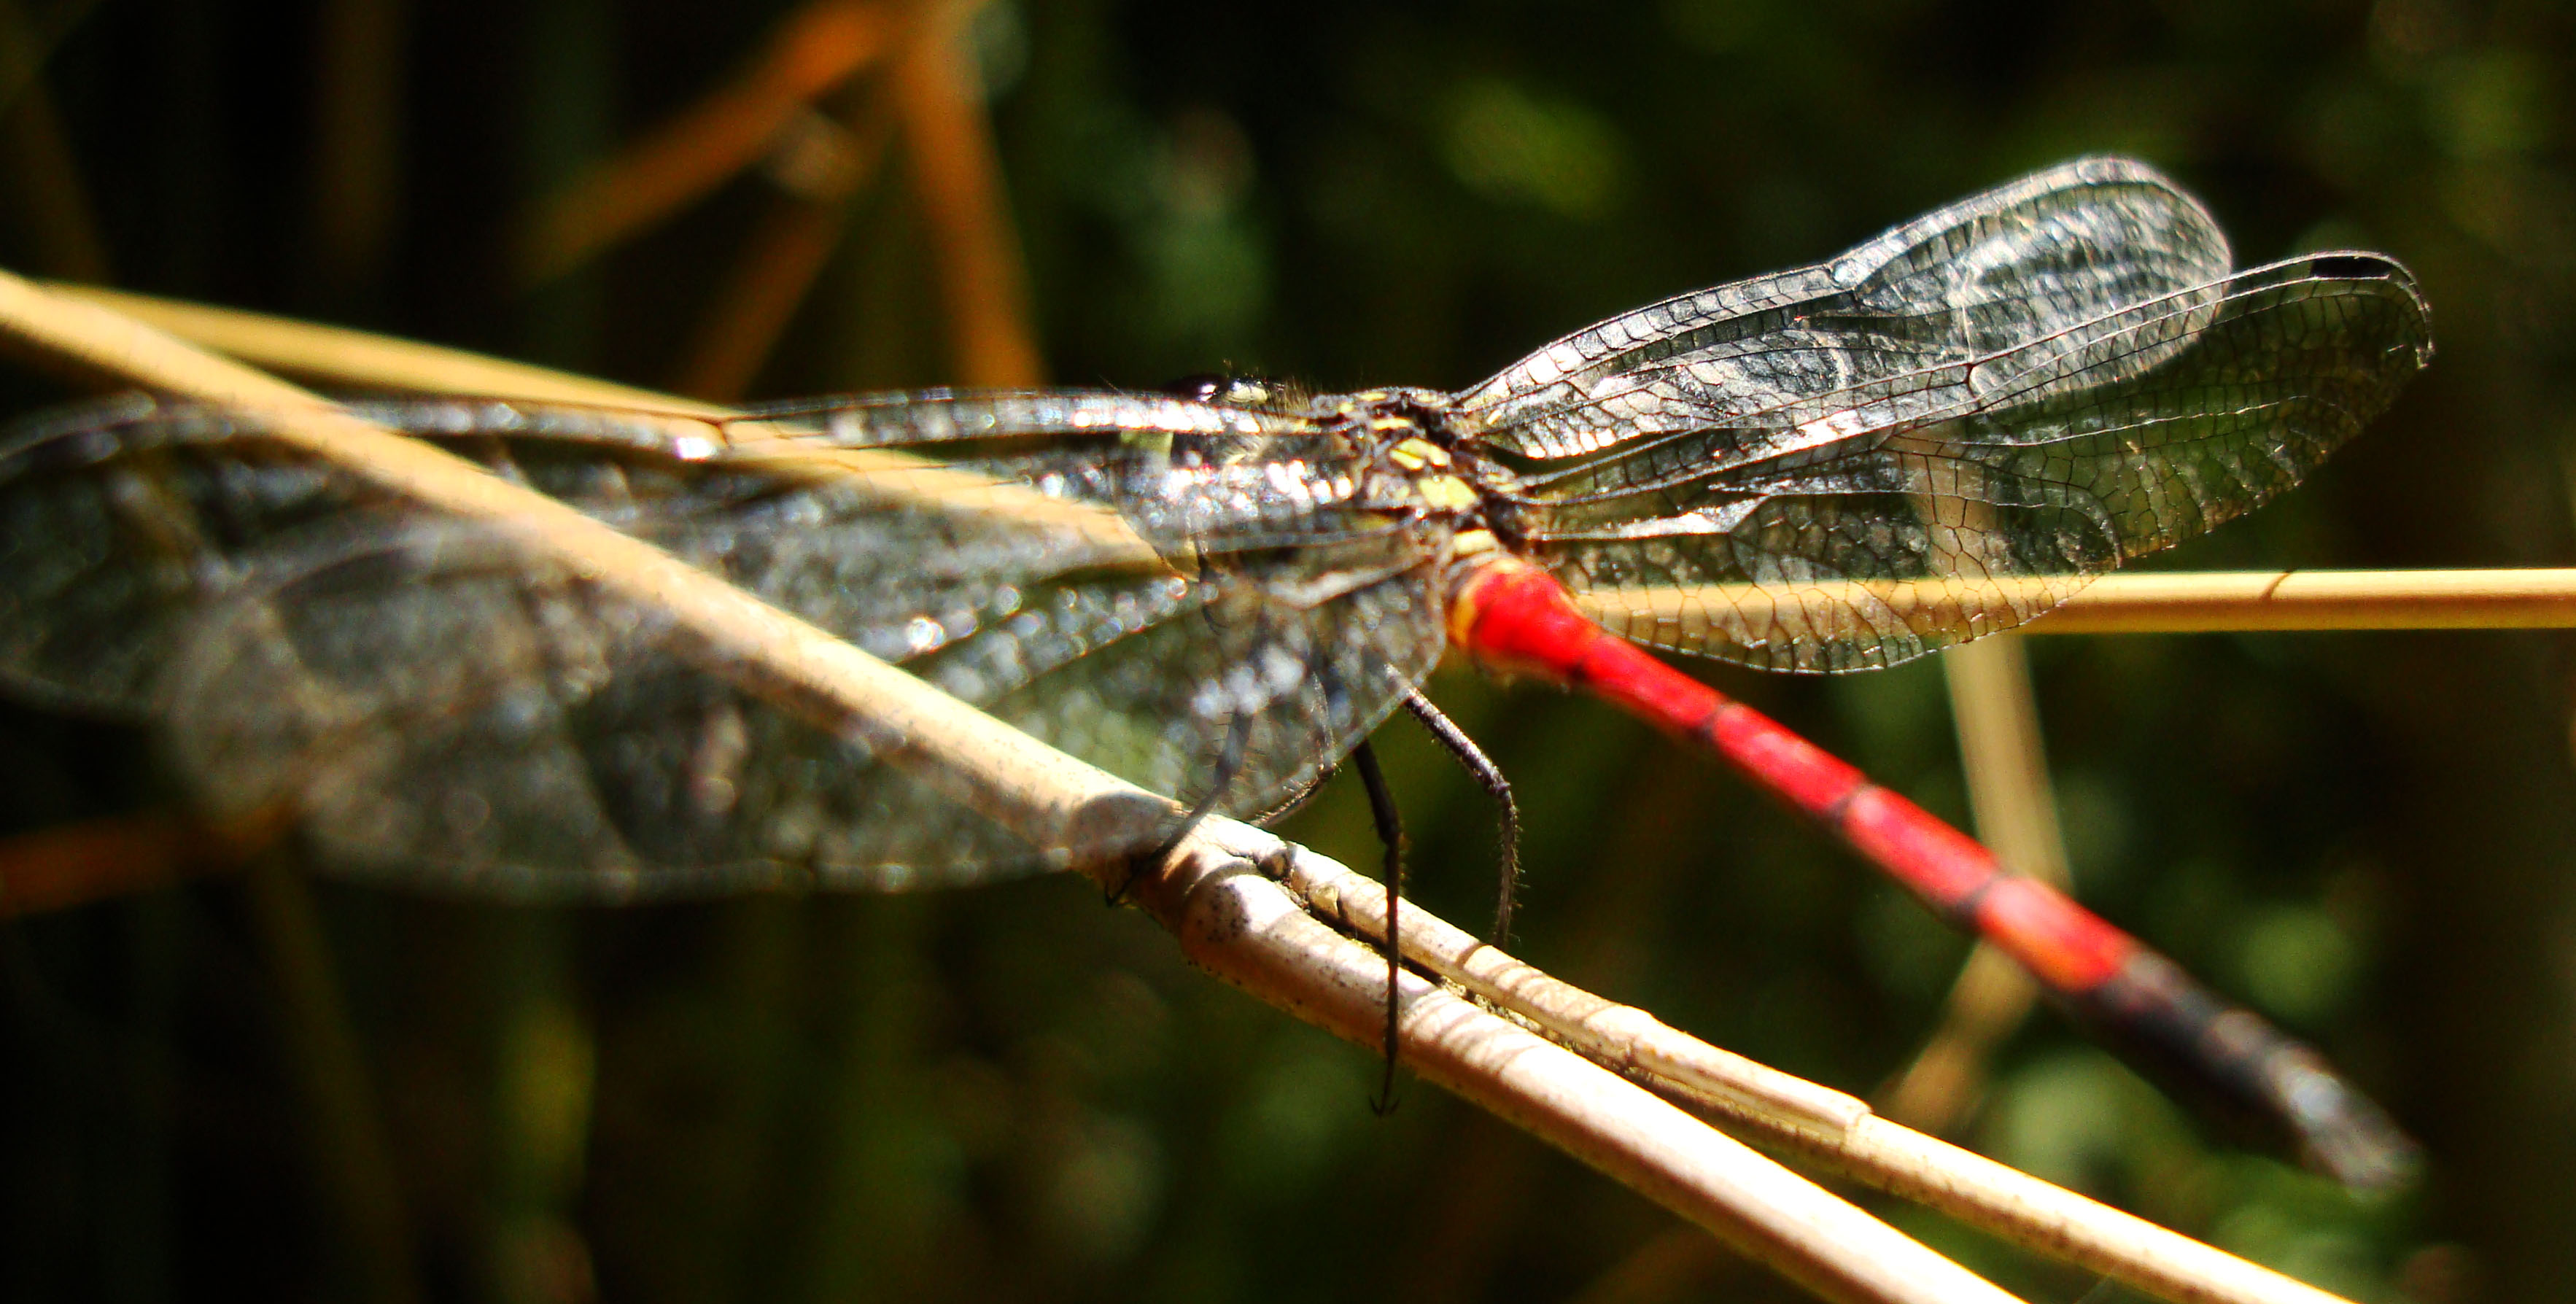 Libellulidae Red Swampdragon Agrionoptera insignis allogenes Sunshine Coast Qld Australia 151